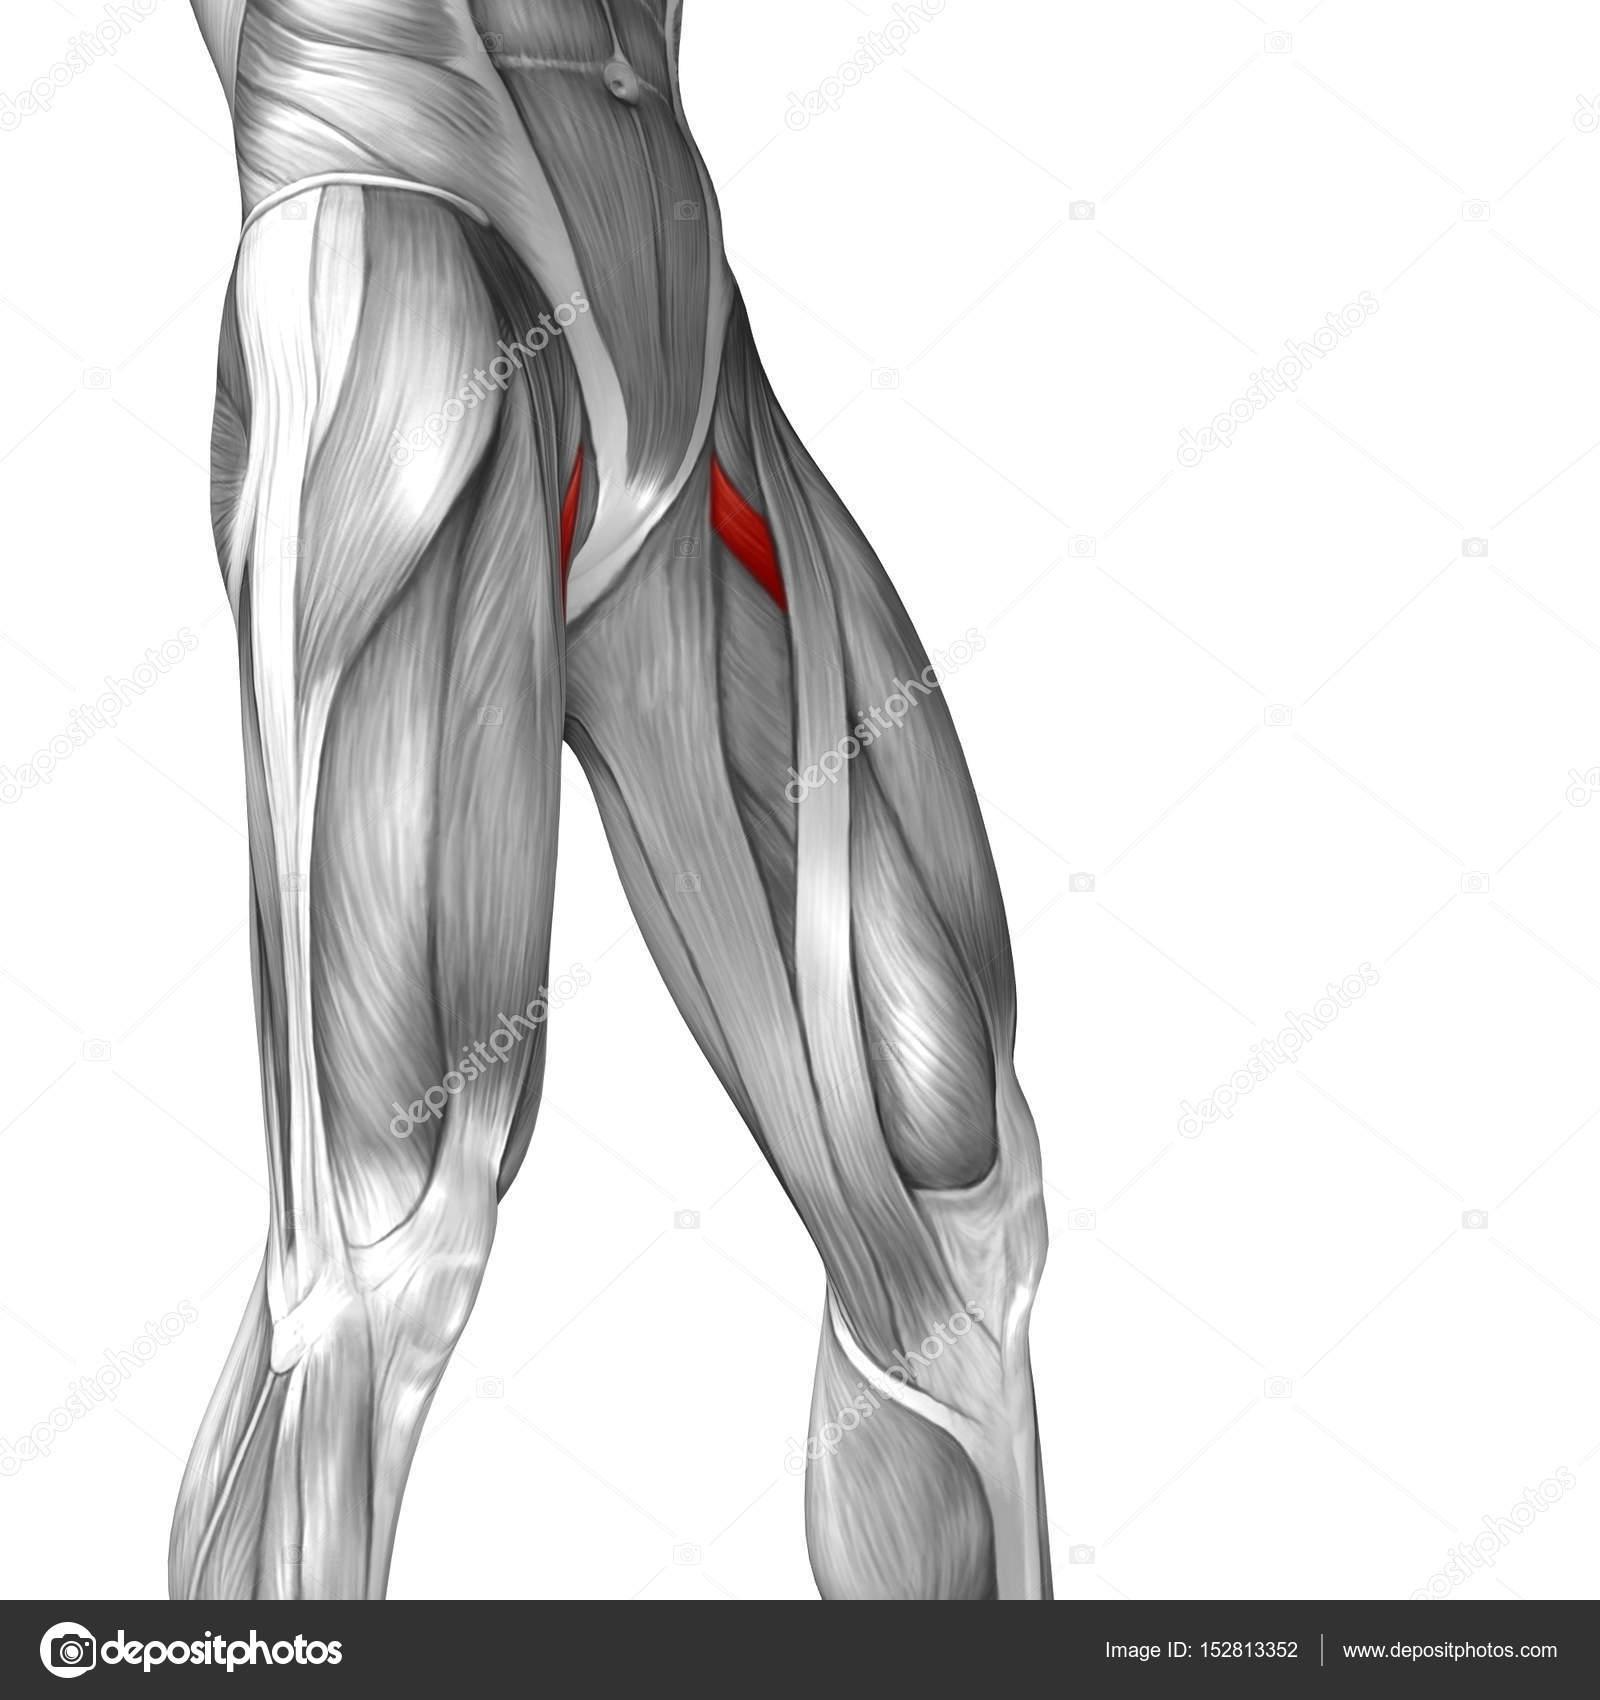 anatomía humana piernas superiores — Foto de stock © design36 #152813352